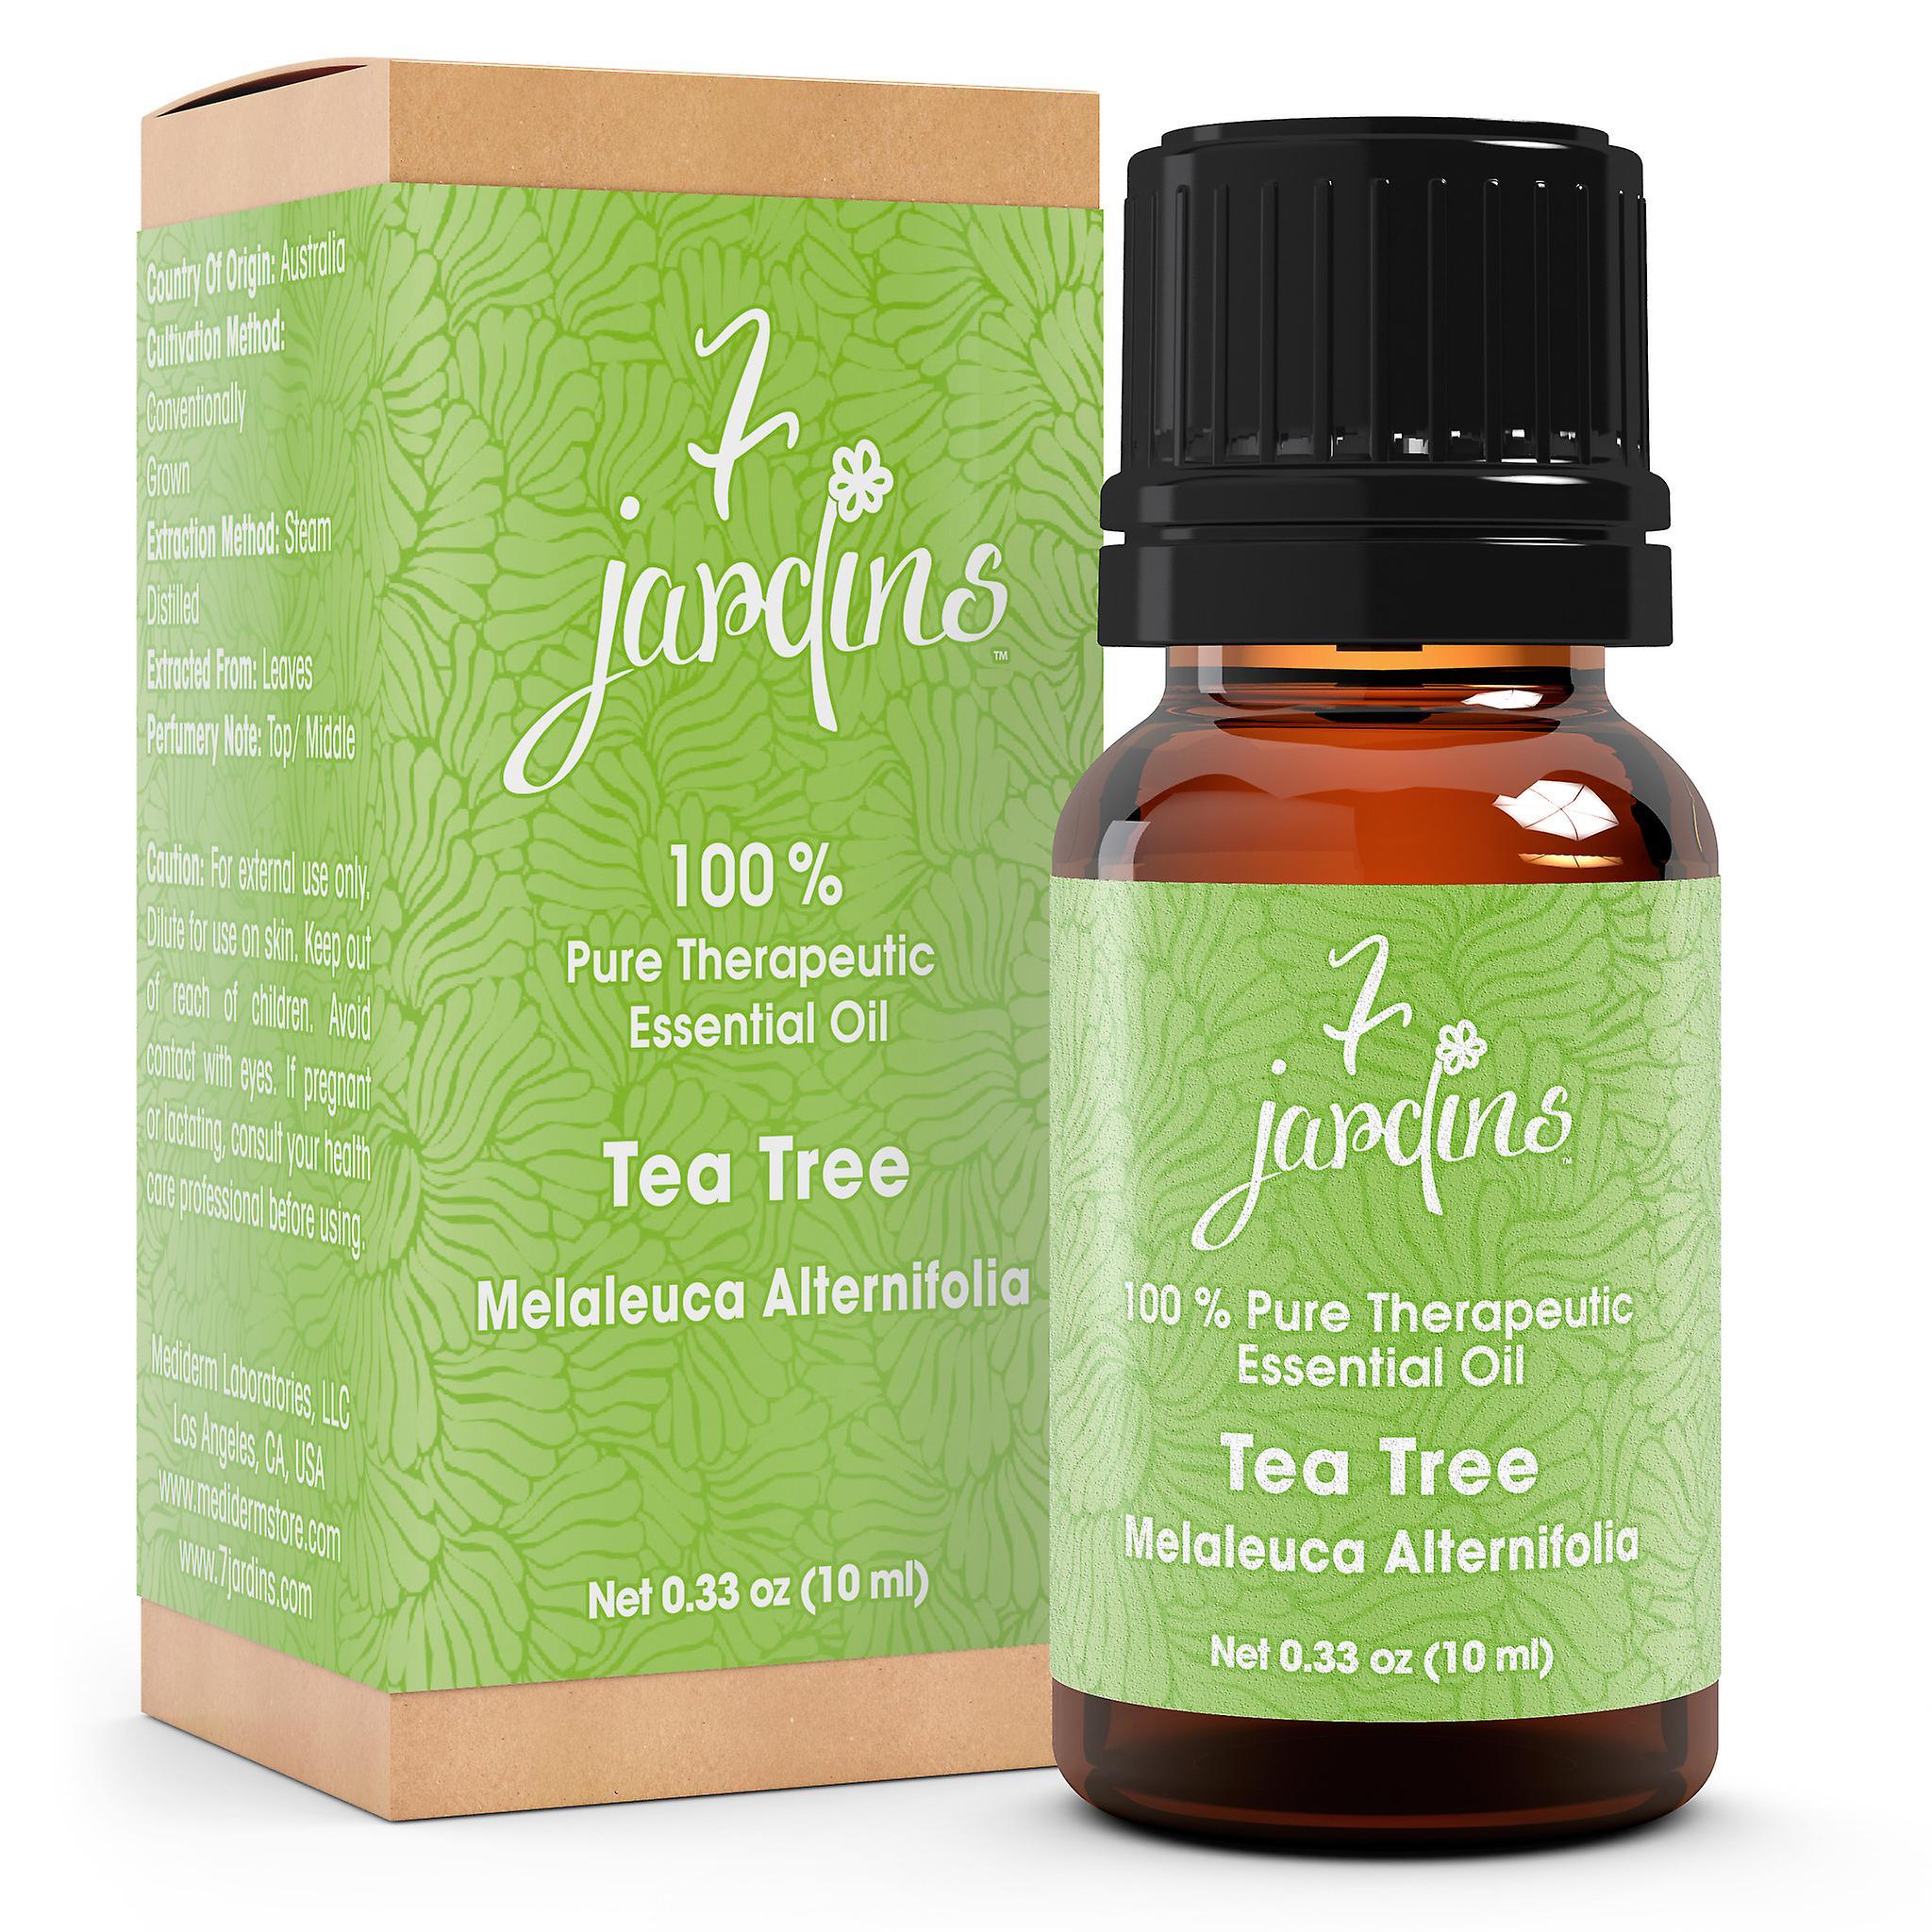 7 Jardins Skin Ailment Therapeutic Essential Oil ★100% Pure Tea Tree